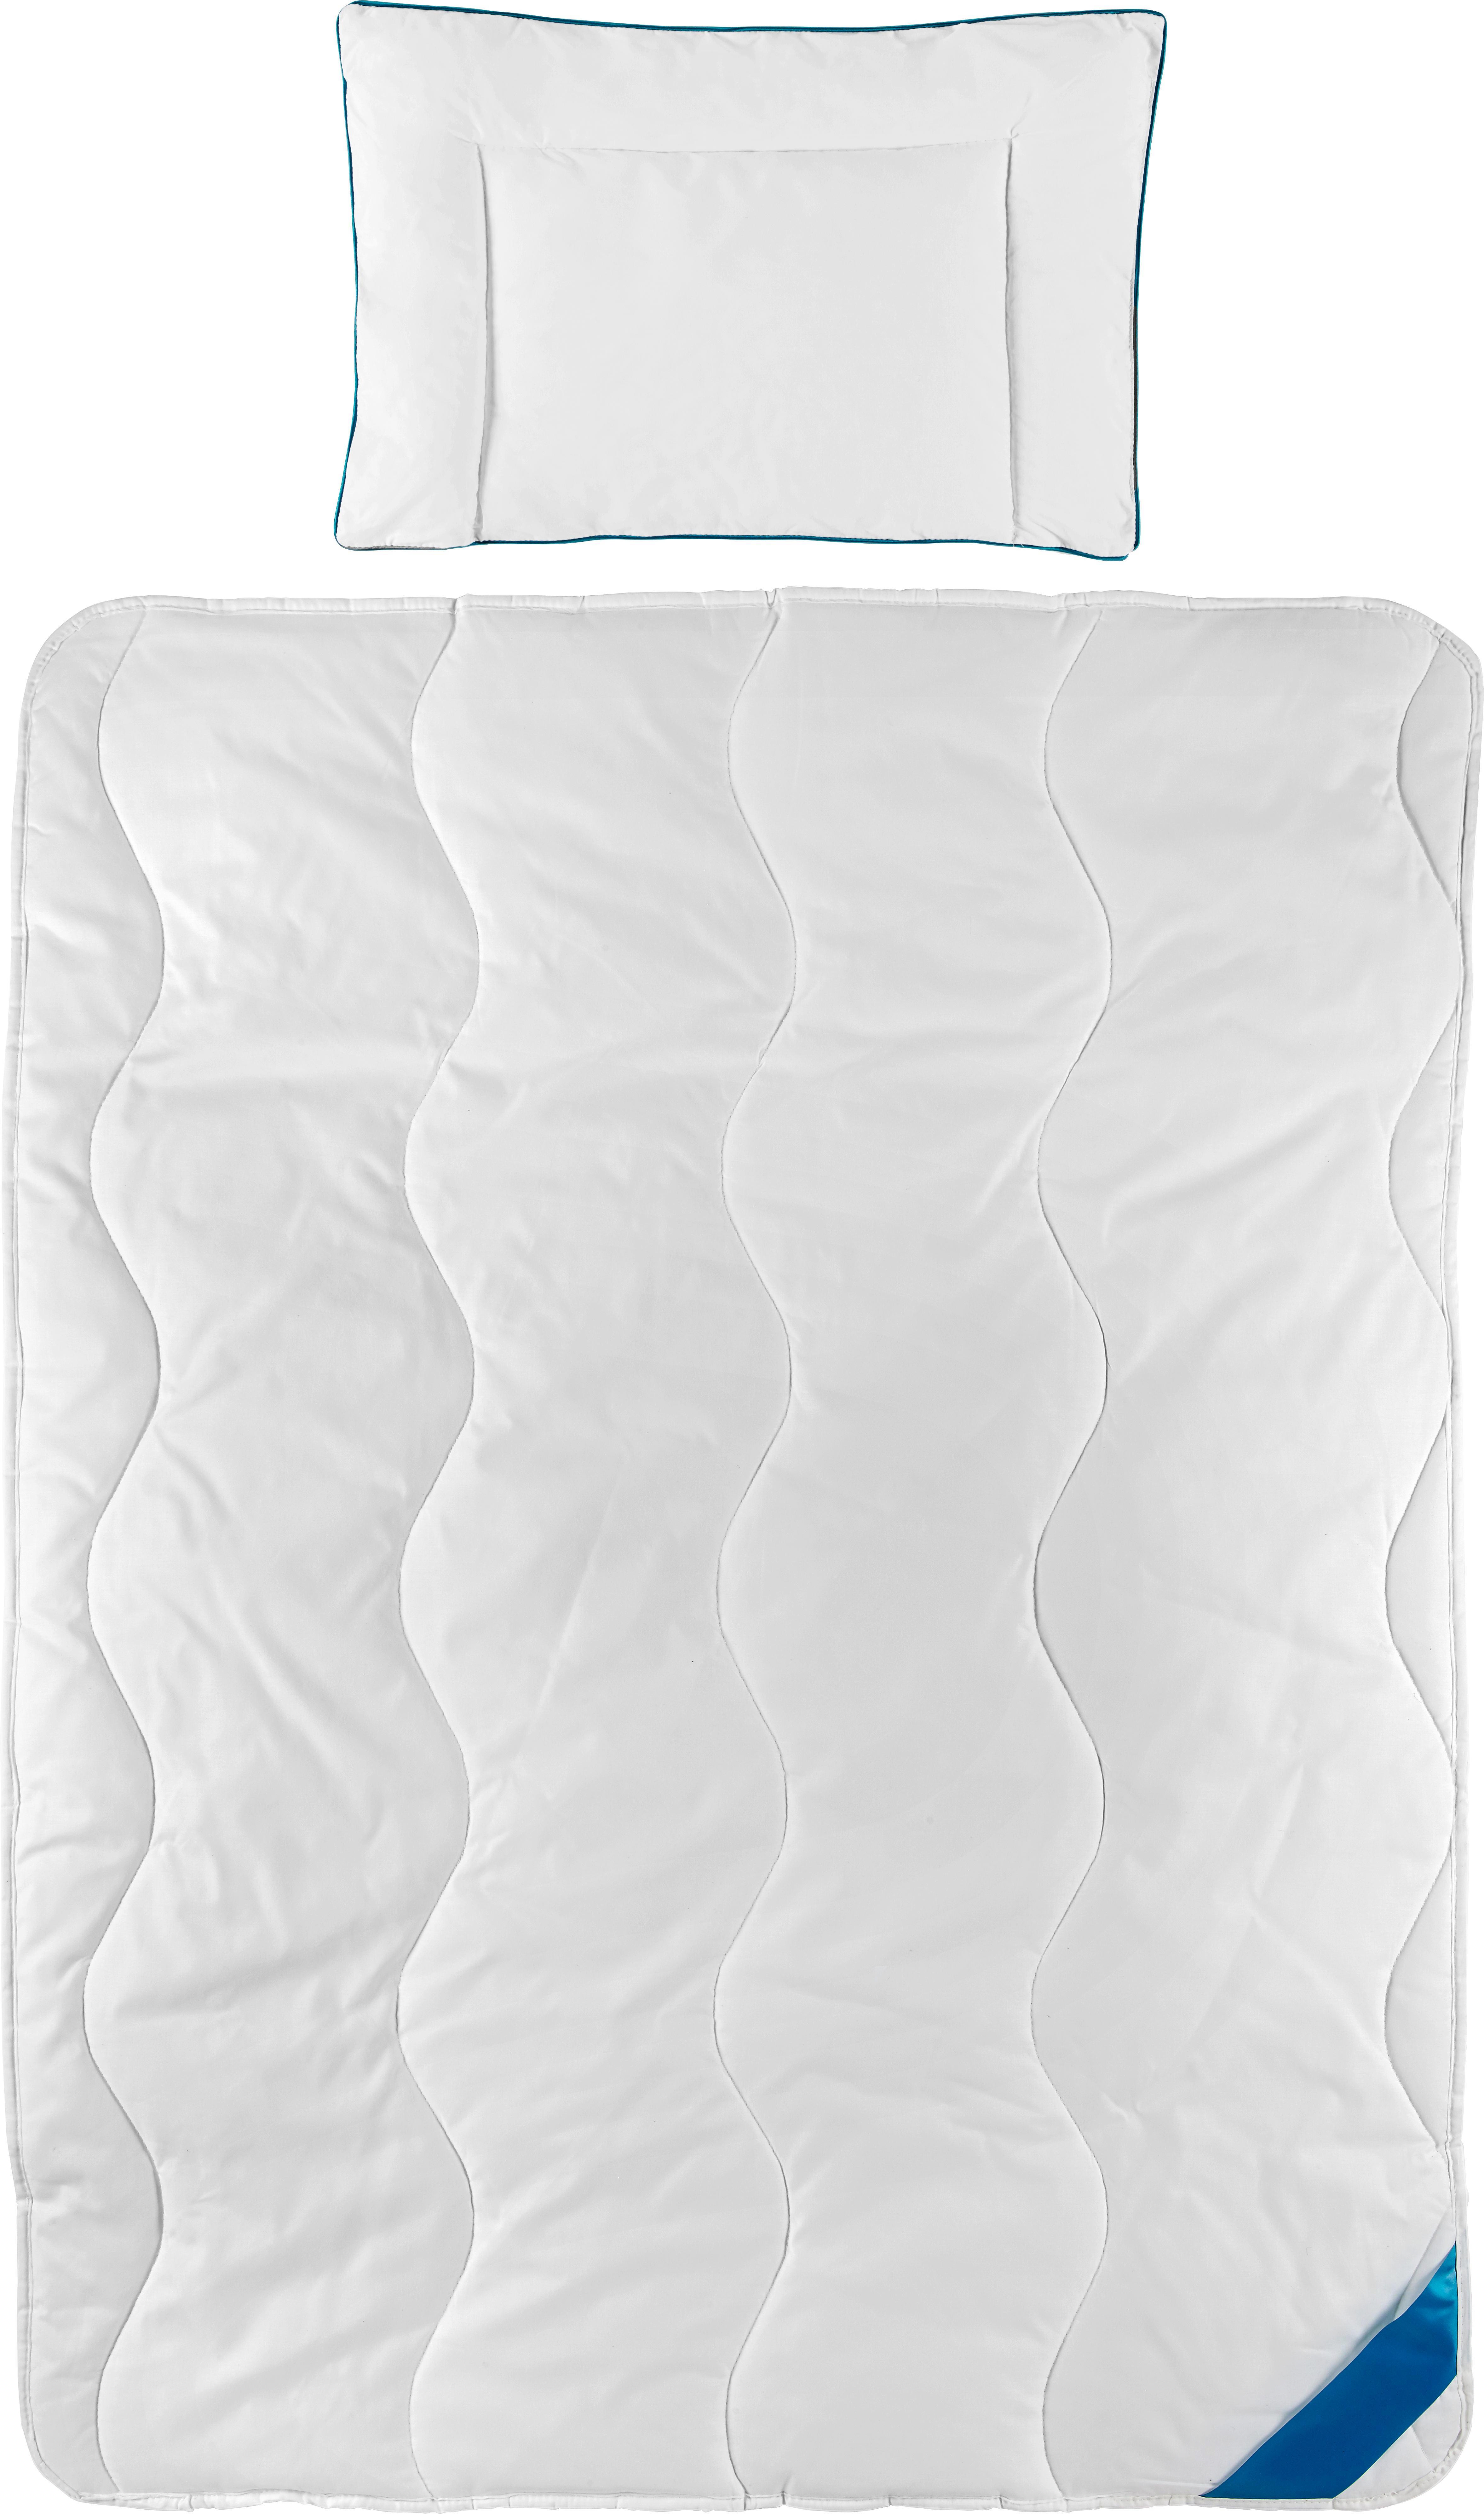 KINDERBETTSET 100/135 cm - Basics, Textil (100/135cm) - MY BABY LOU